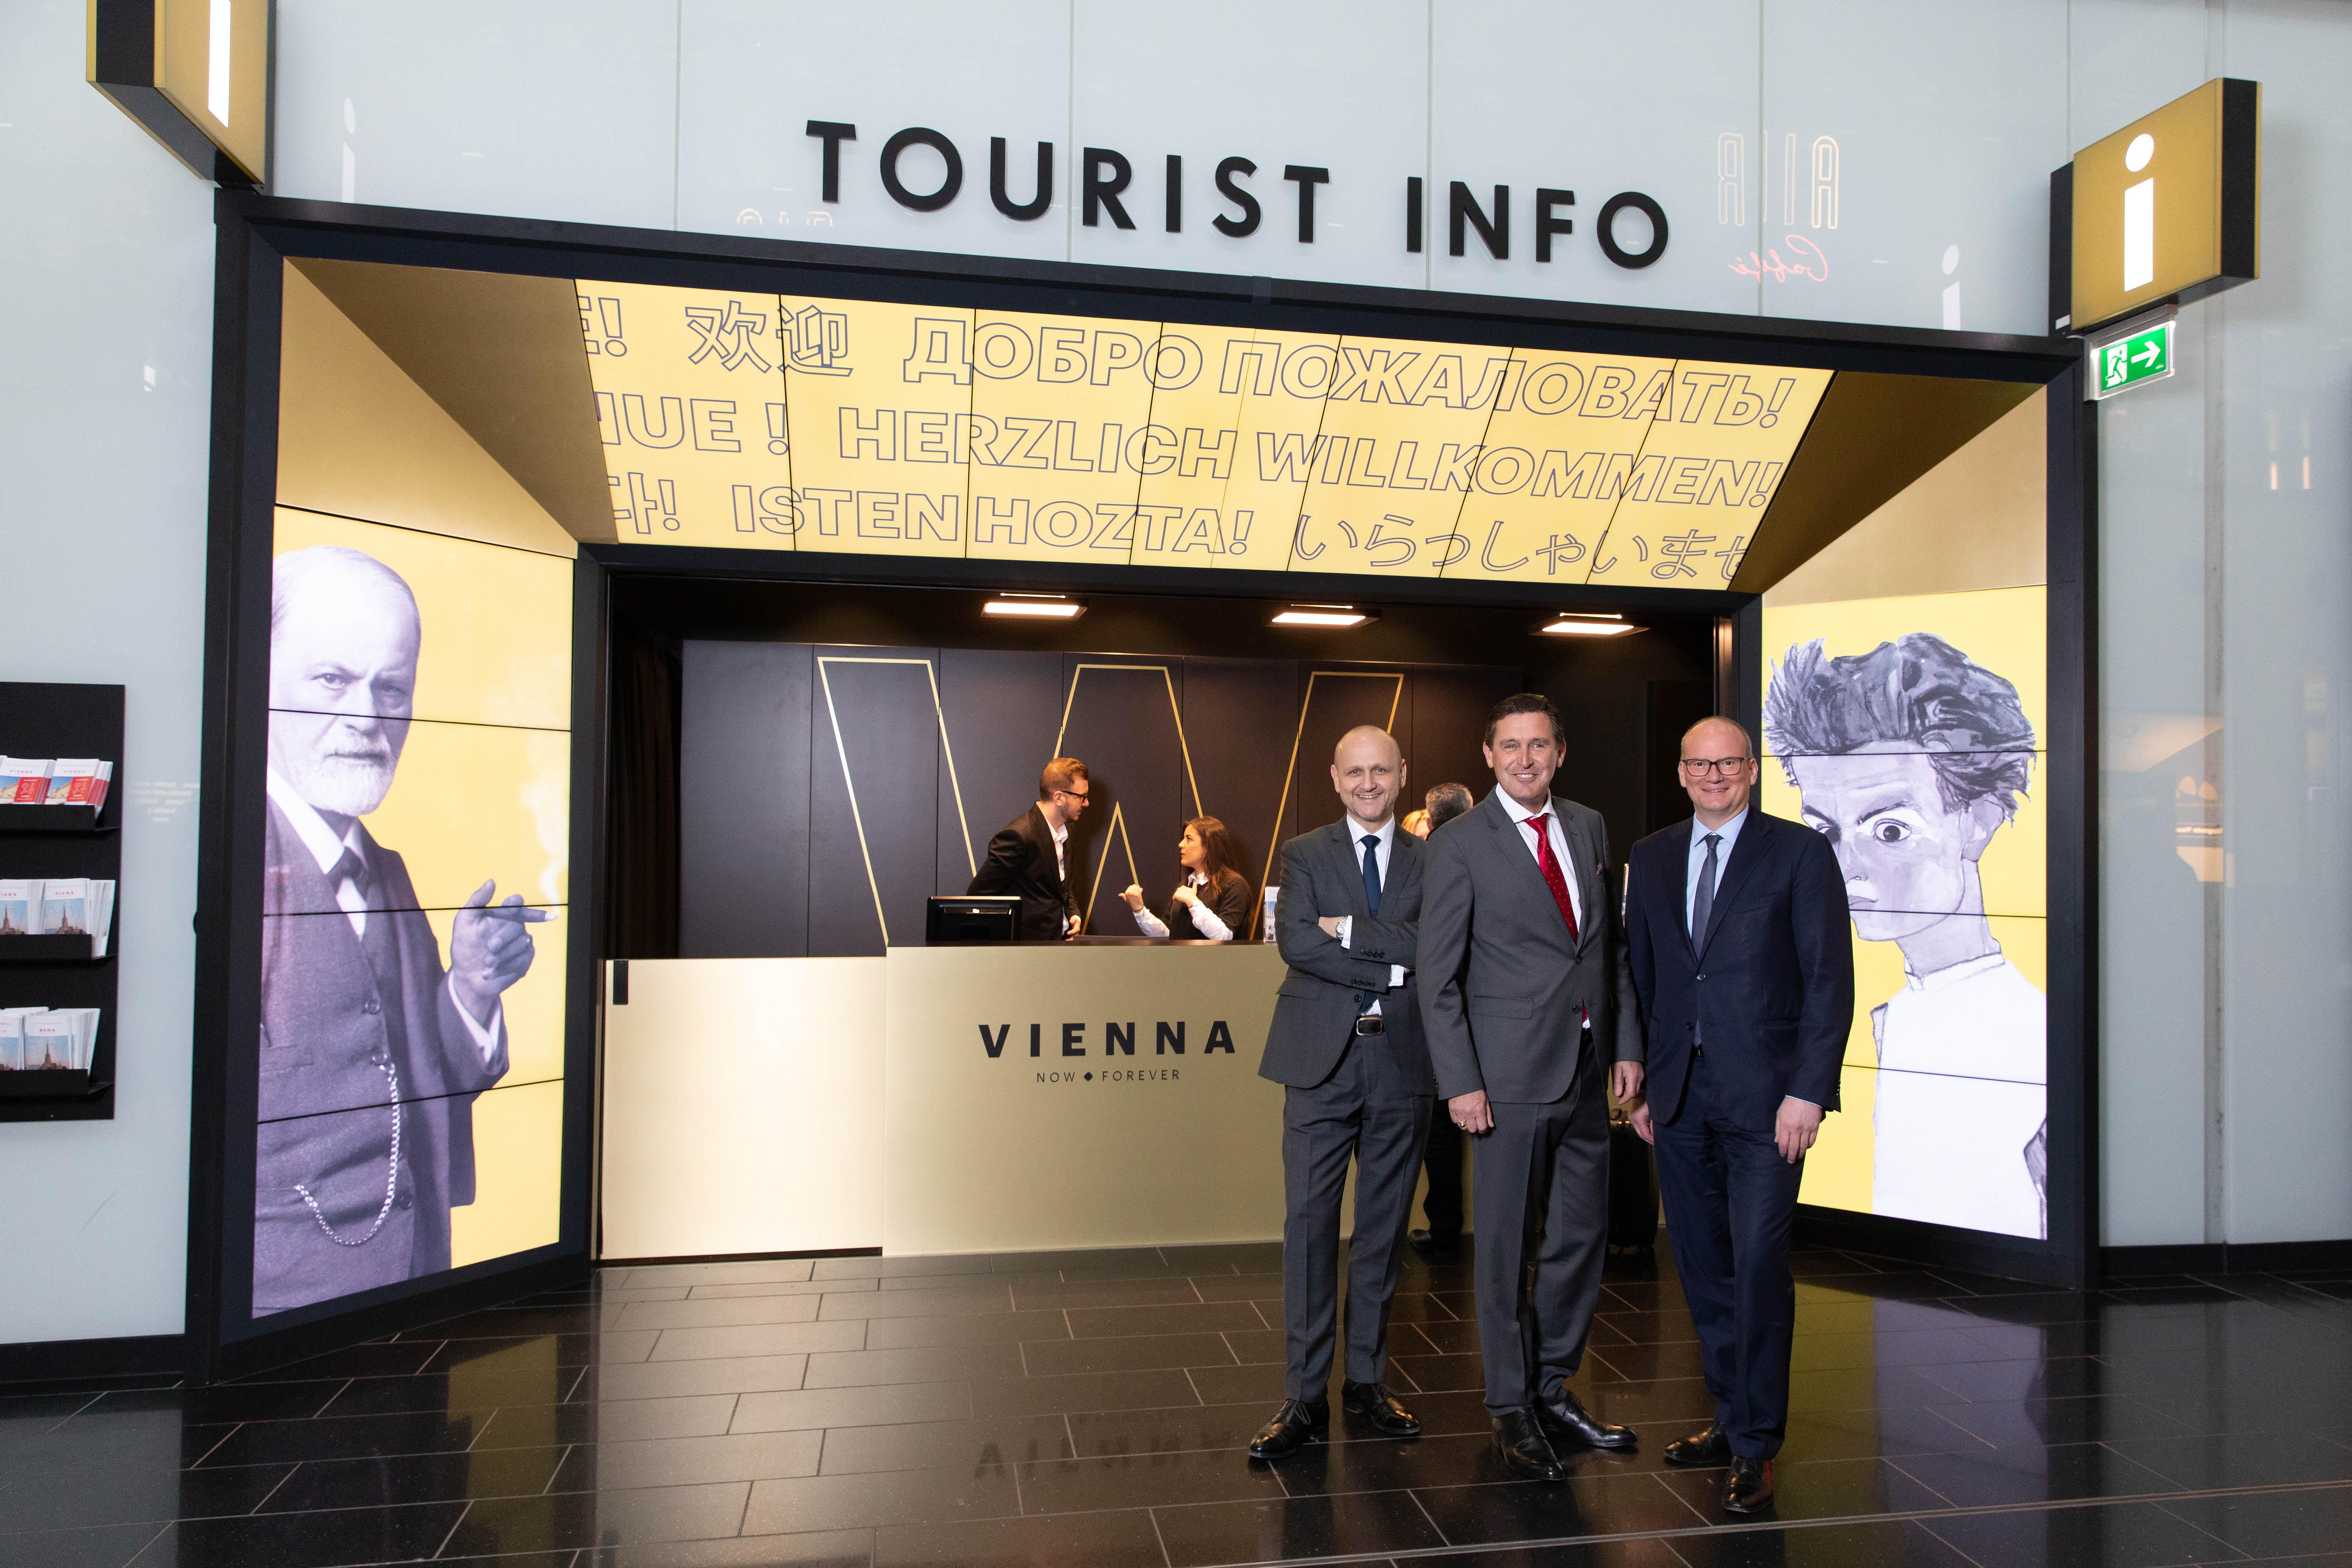 Tourist Info am Flughafen Wien